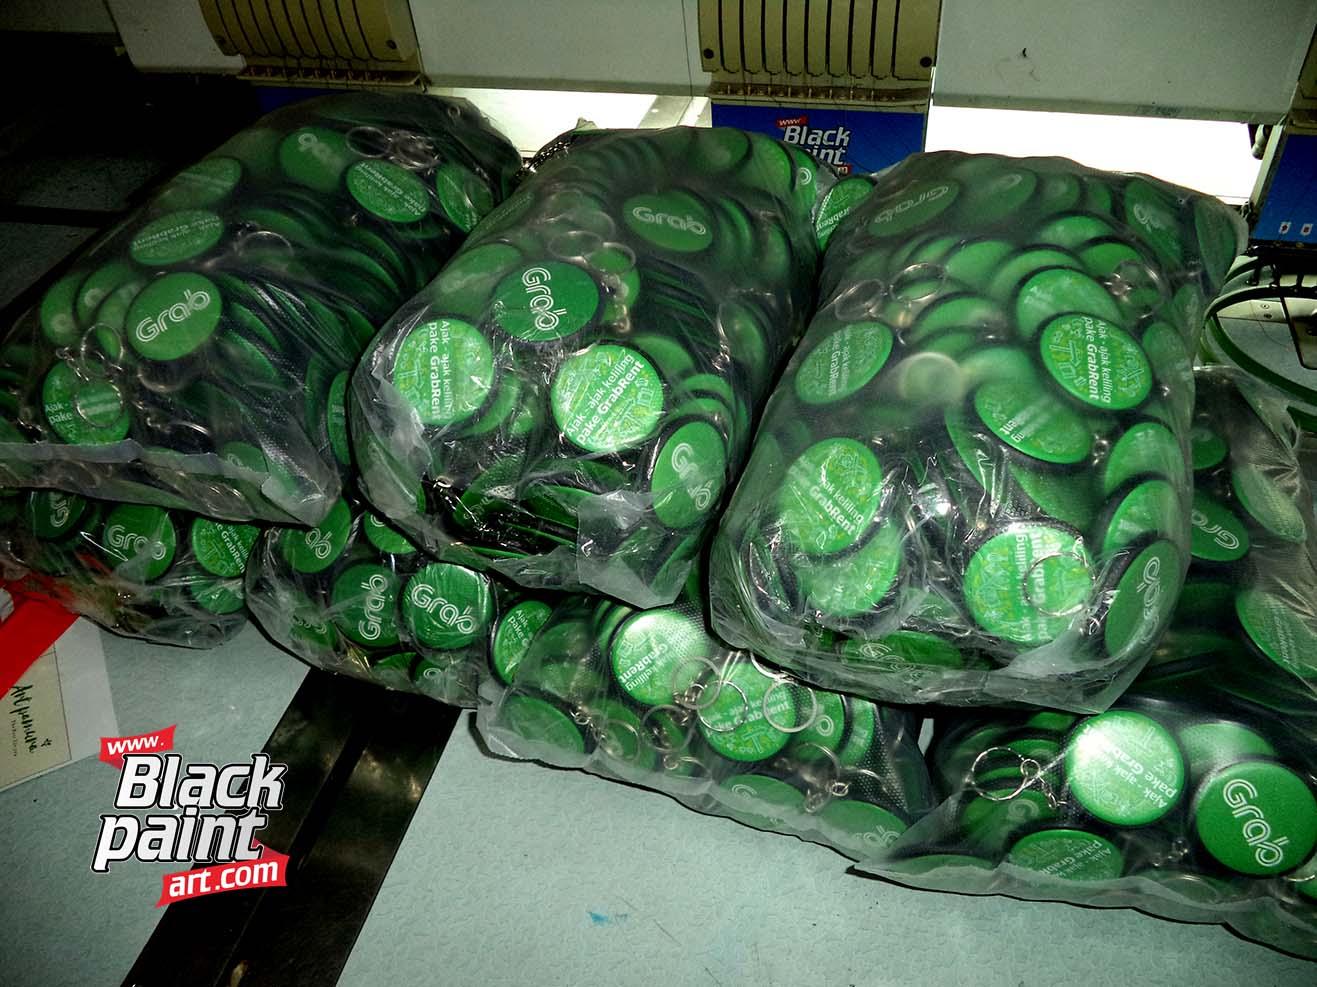 Blackpaint Art ini adalah salah satu tempat cetak PIN di Pekanbaru lho.